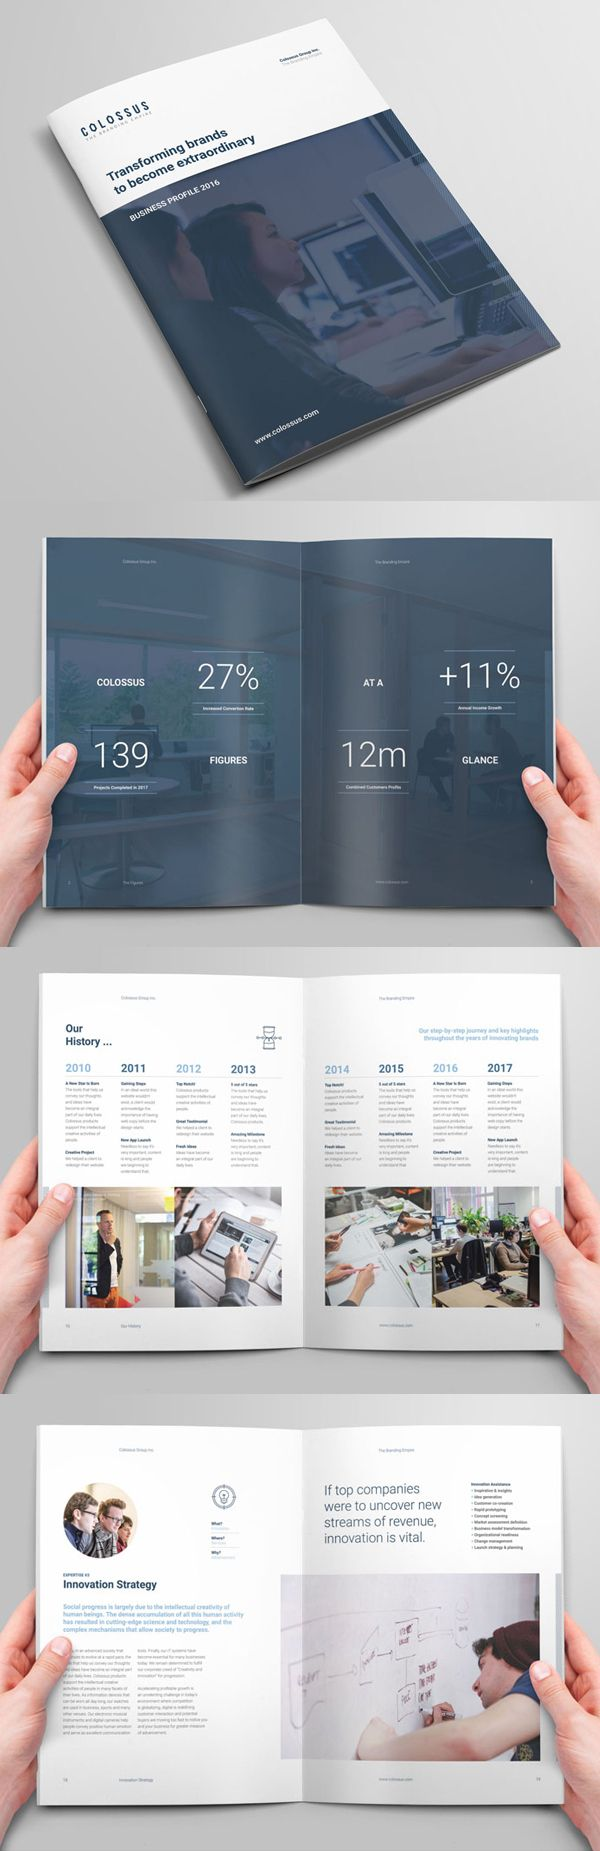 Corporate Profile Brochure #annualreport #booklet #brochuredesign #brochuretemplates #fashioncatalog #catalogdesign